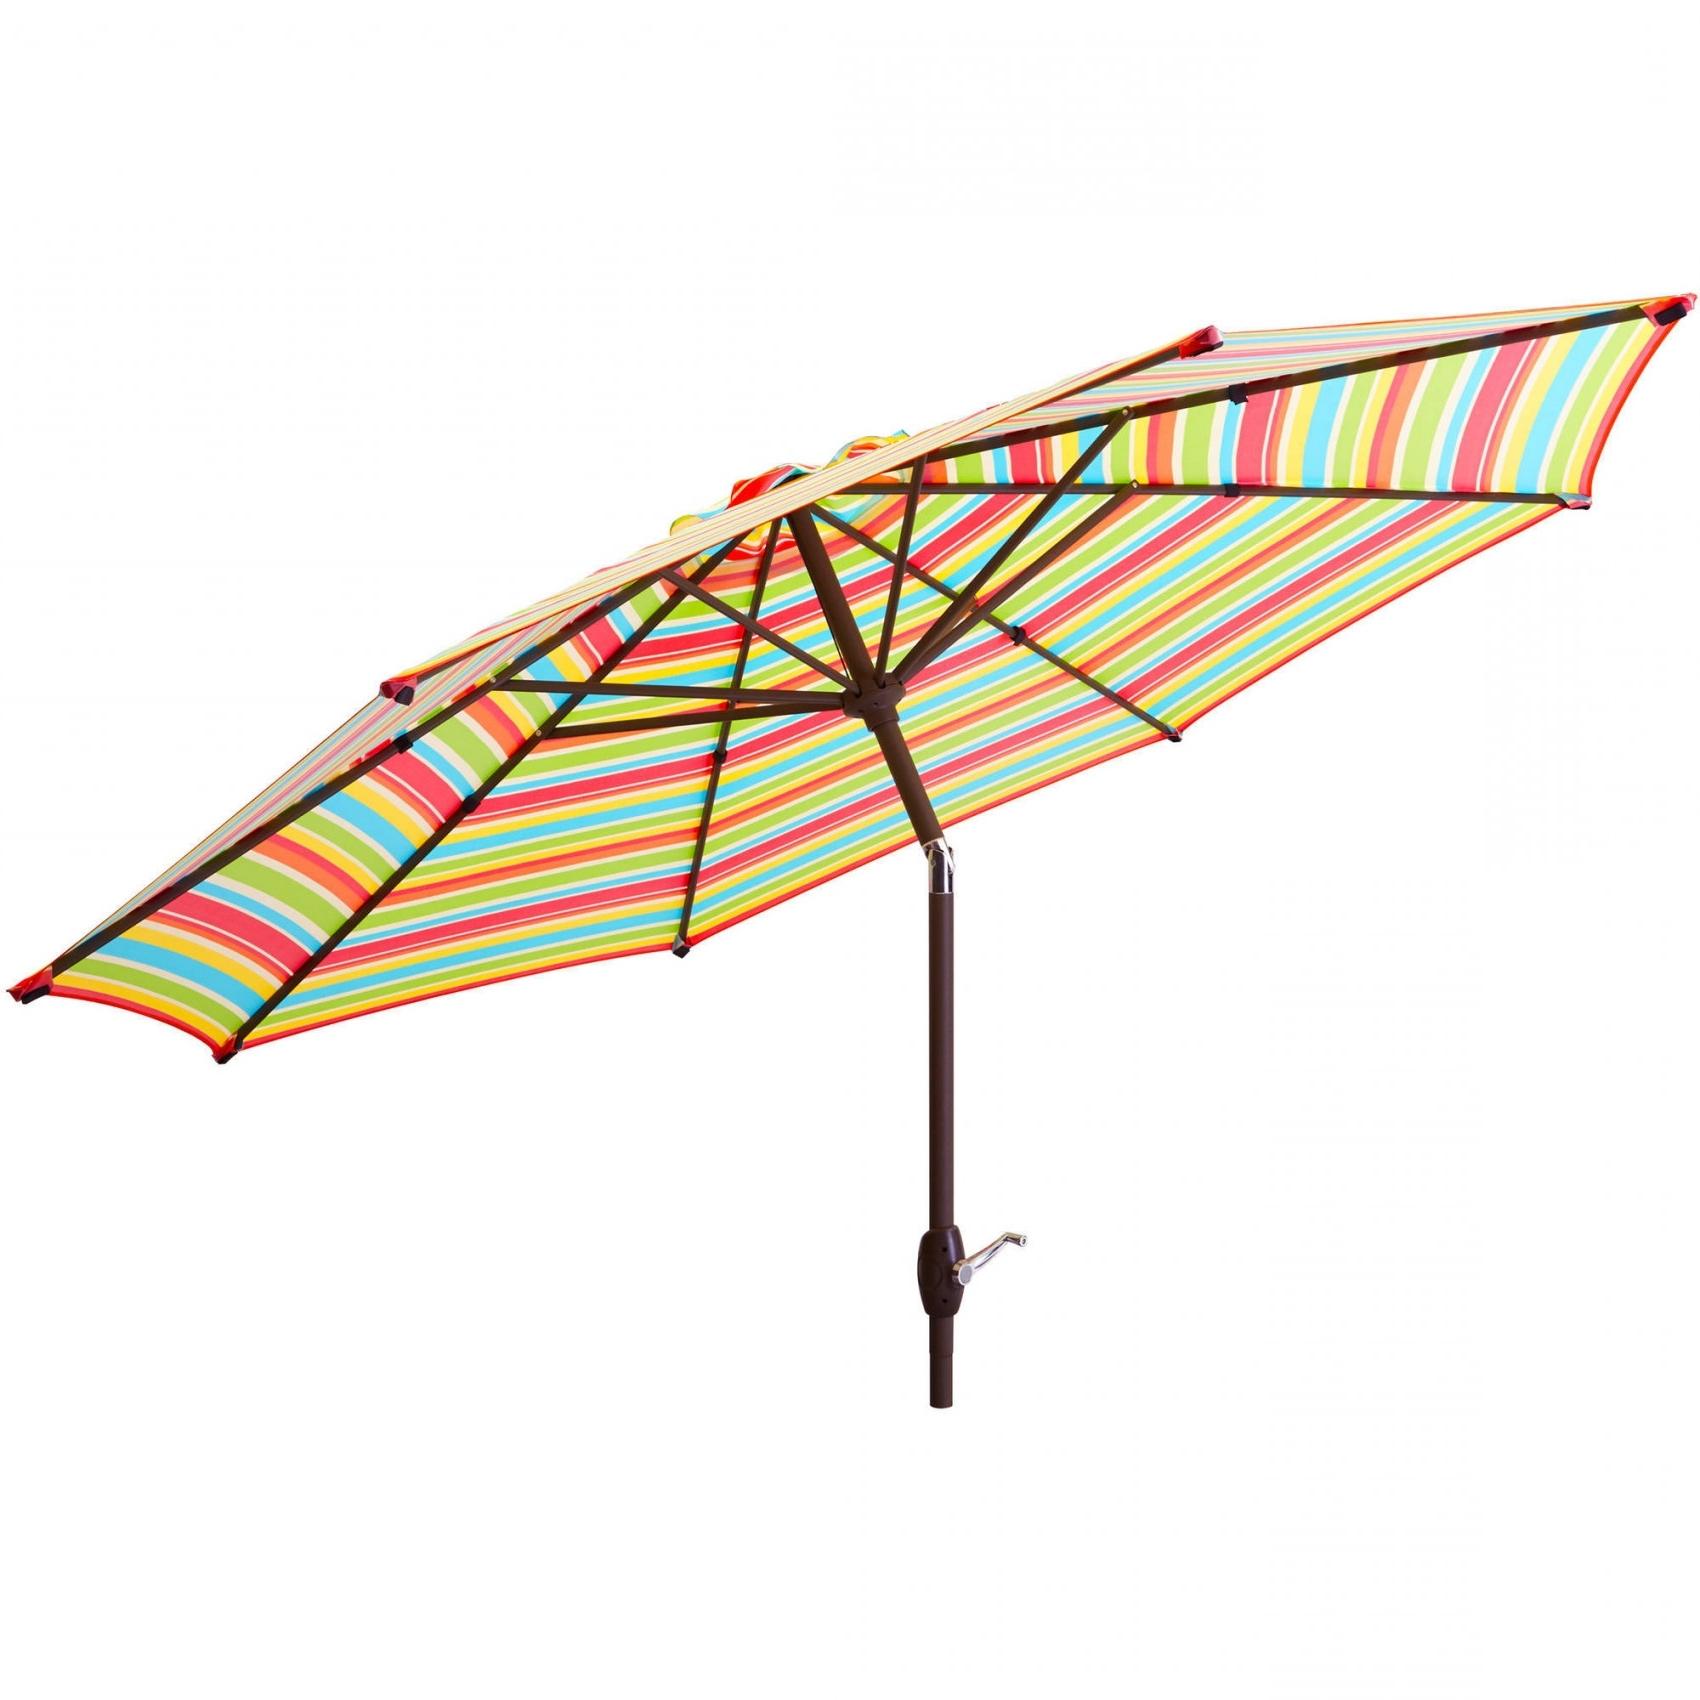 Patio Umbrellas Walmart – Home Design Ideas With Current Walmart Umbrellas Patio (View 8 of 20)